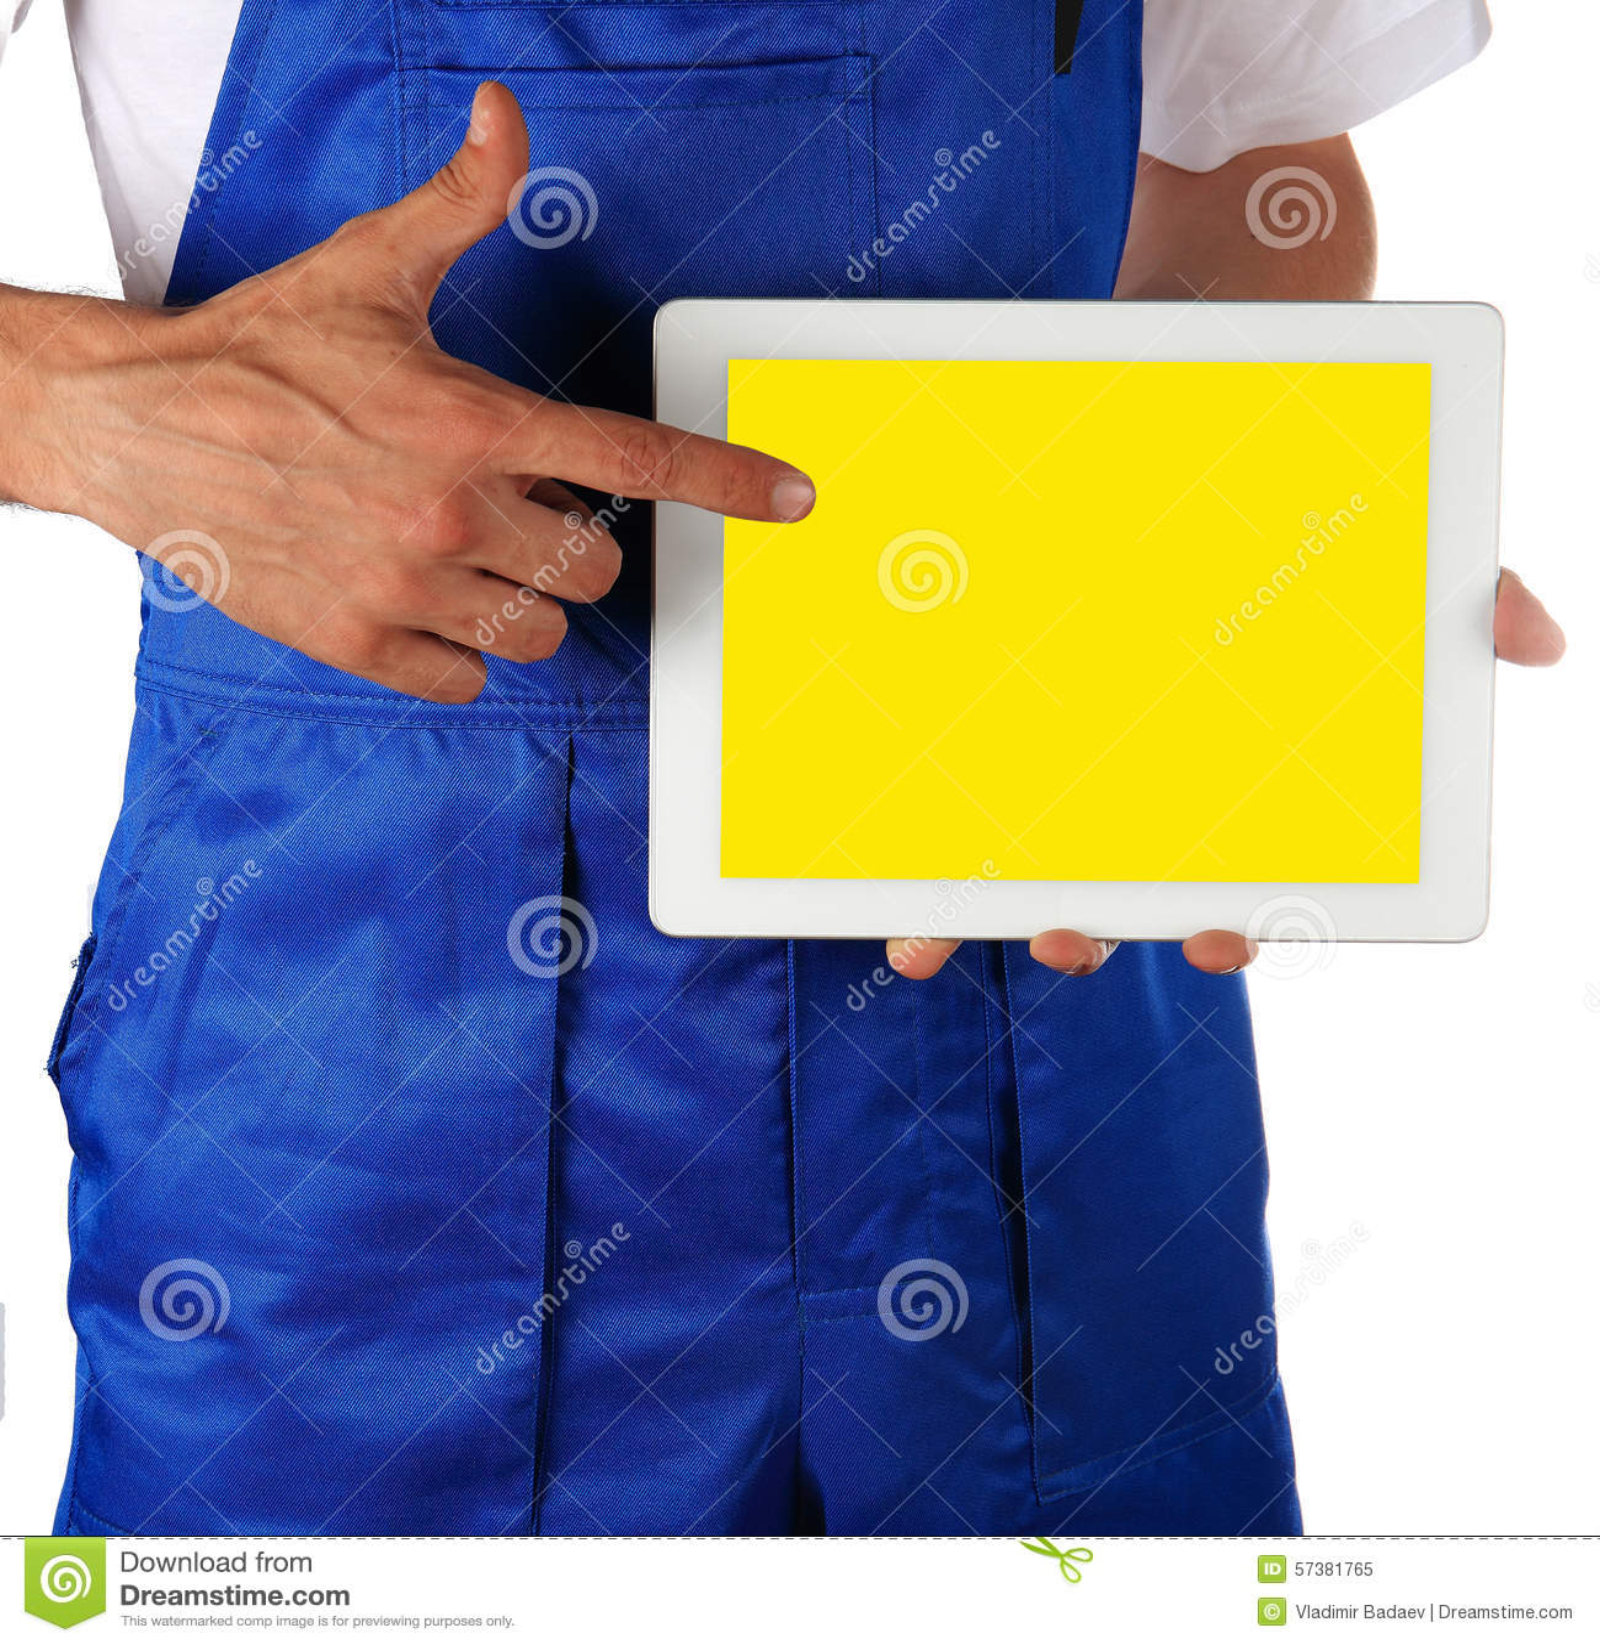 Handarbeidersmens met tablet